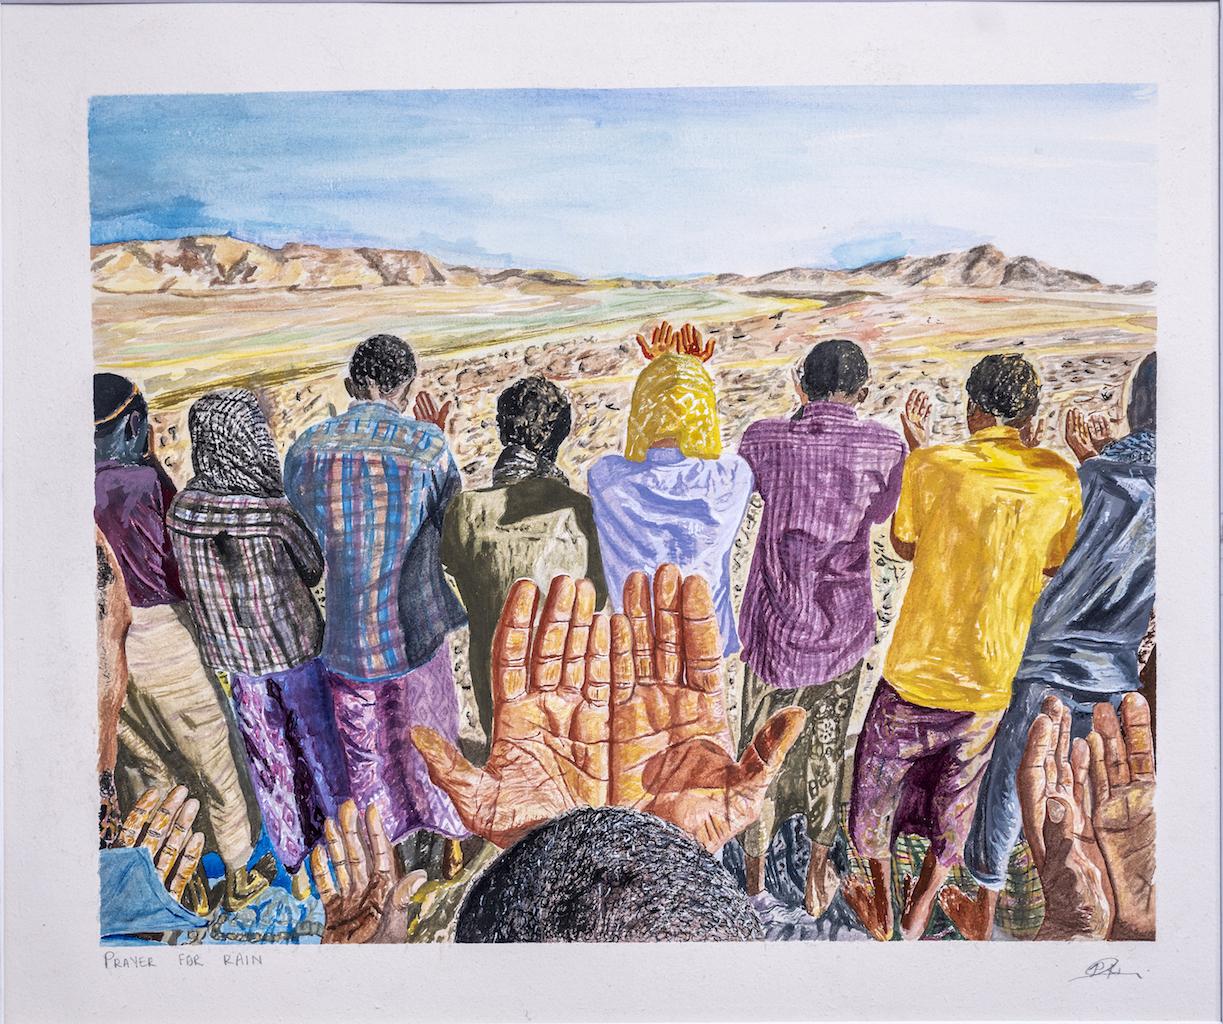 POLOKO MOHANOE, Prayer for rain, Gouache on Fabriano, 66 x 72.8 cm